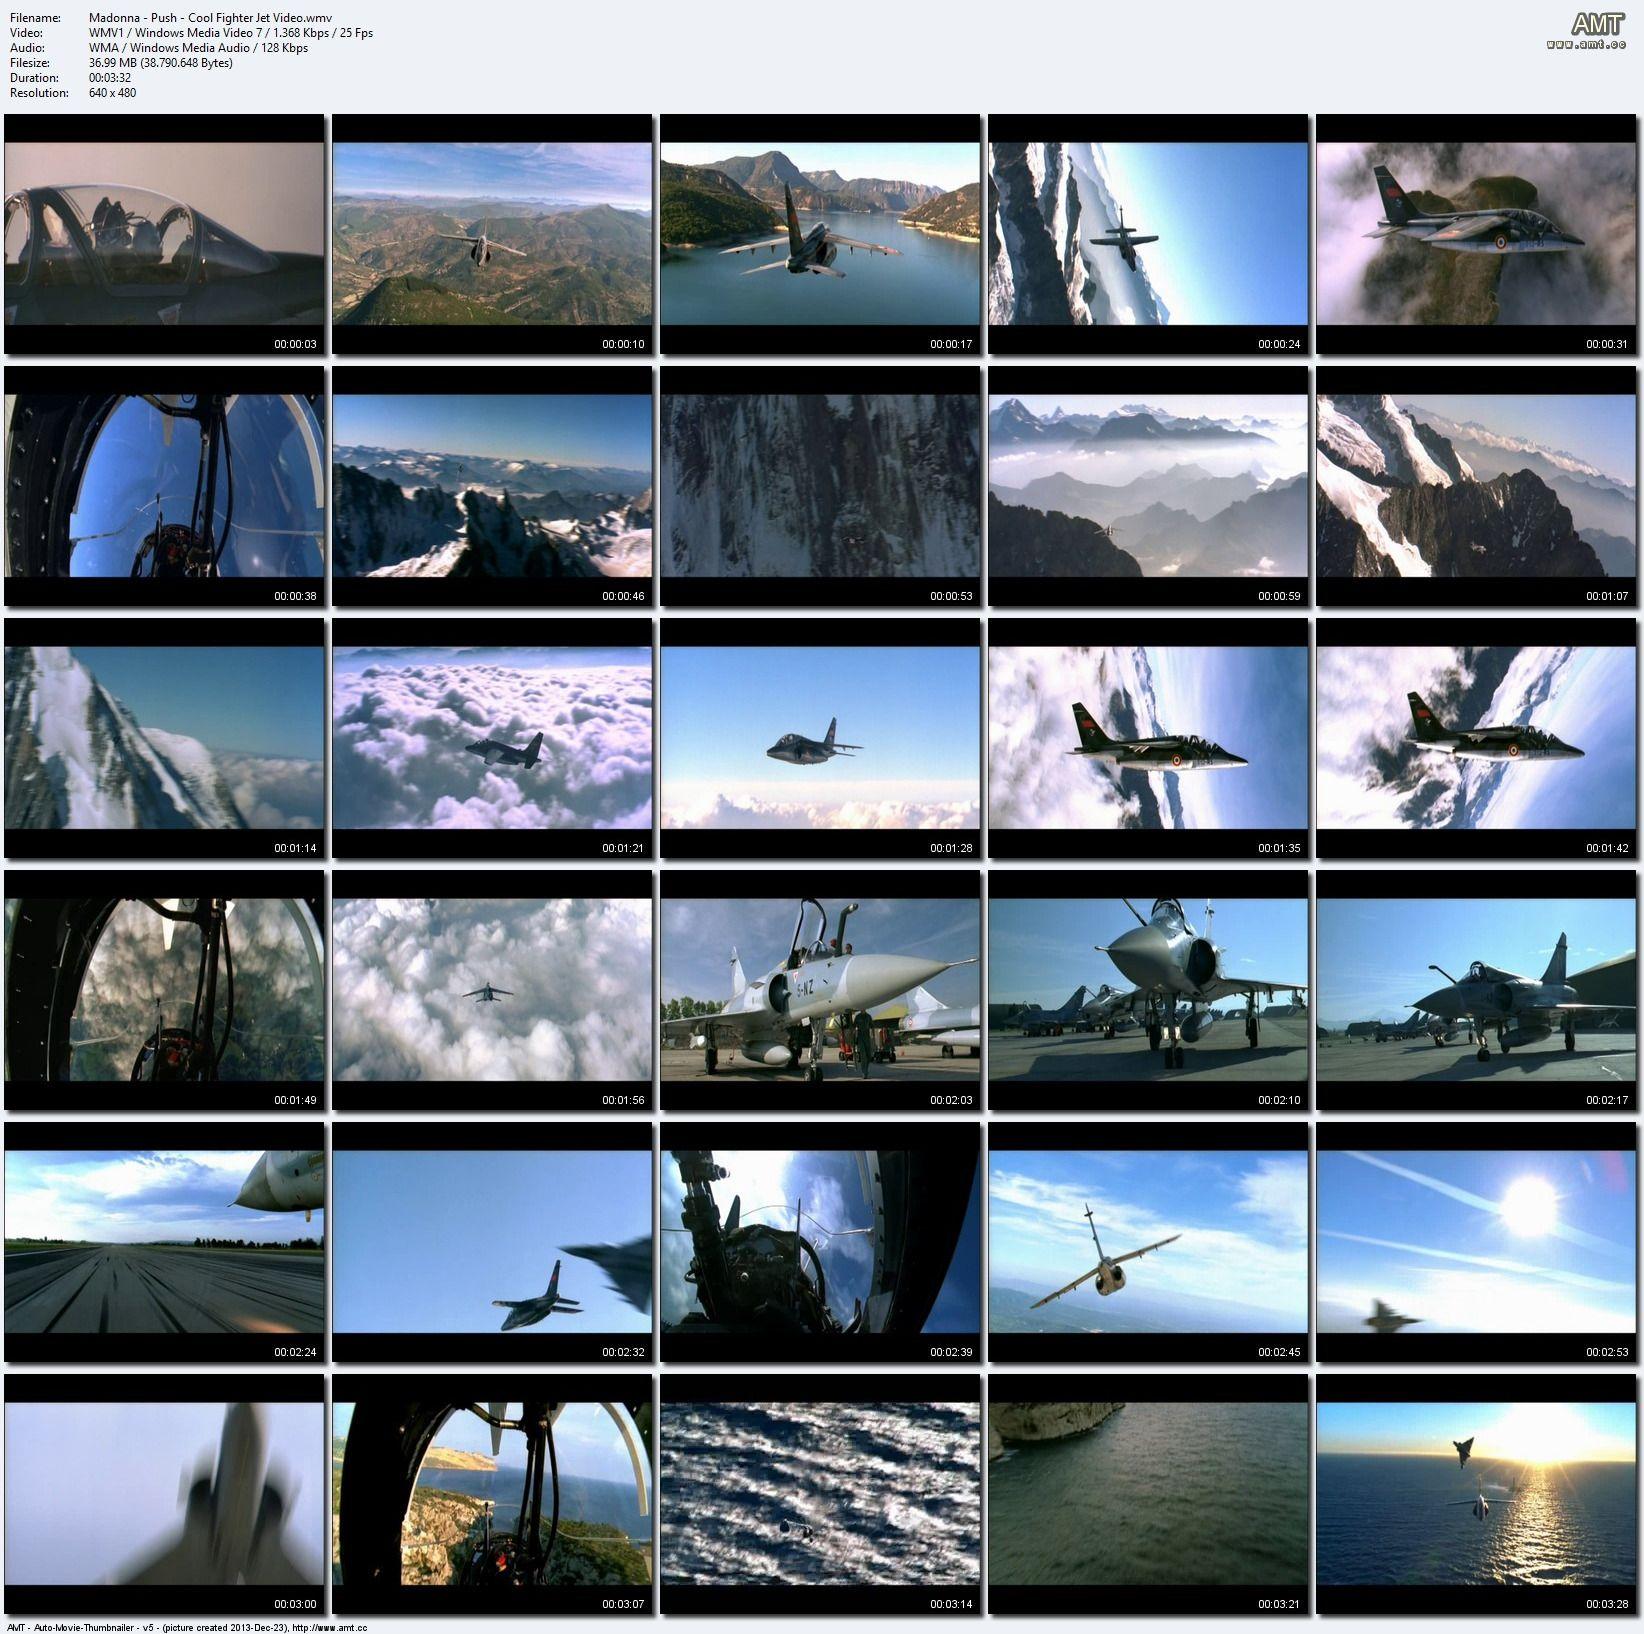 Vorschau AMT - Auto Movie Thumbnailer - Bild 4